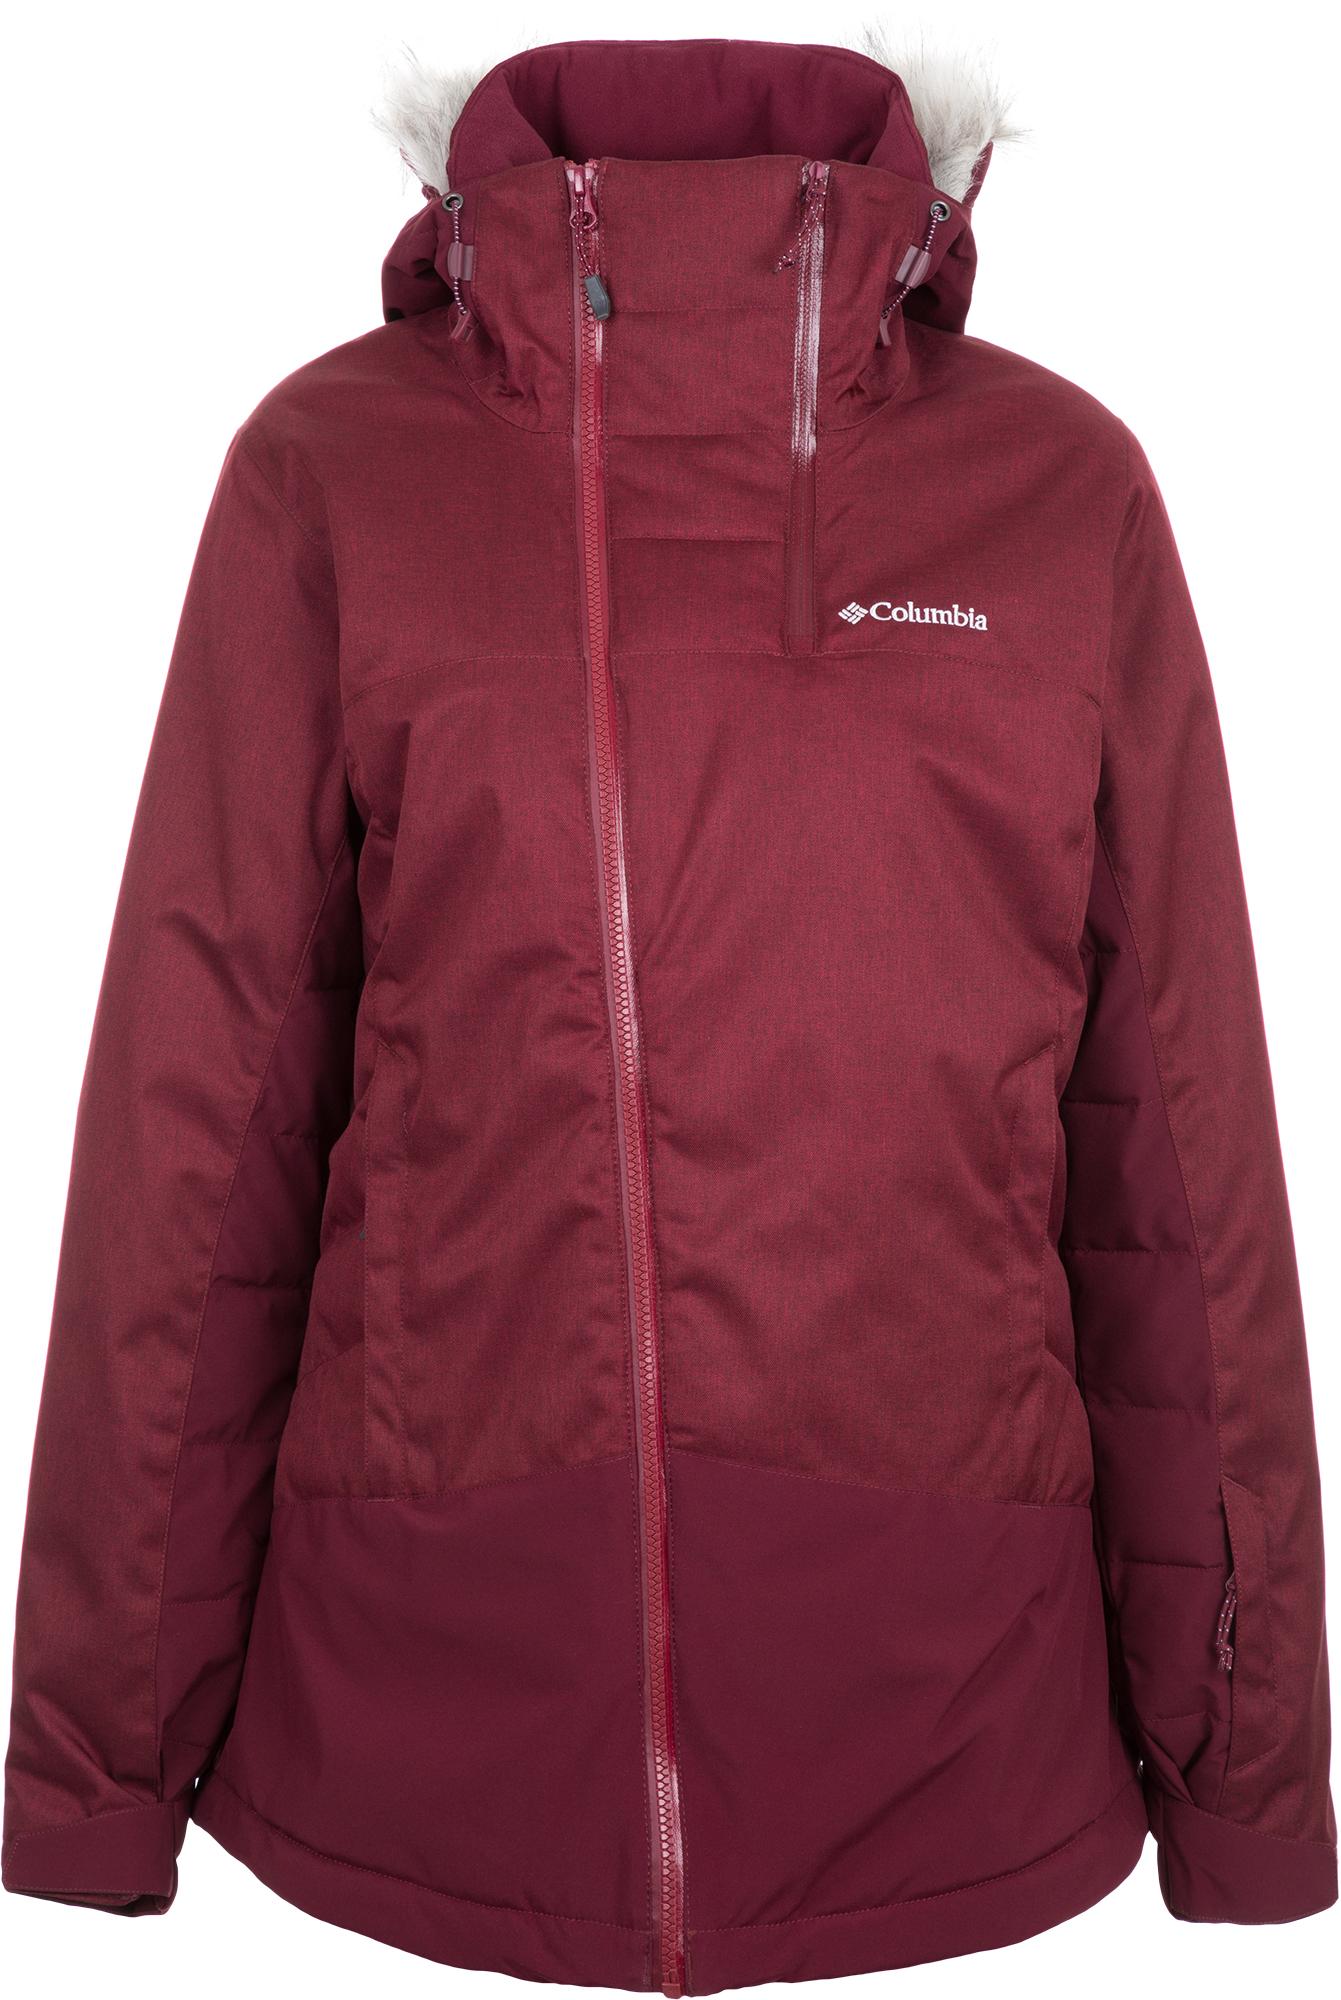 Columbia Куртка утепленная женская Columbia Emerald Lake, размер 48